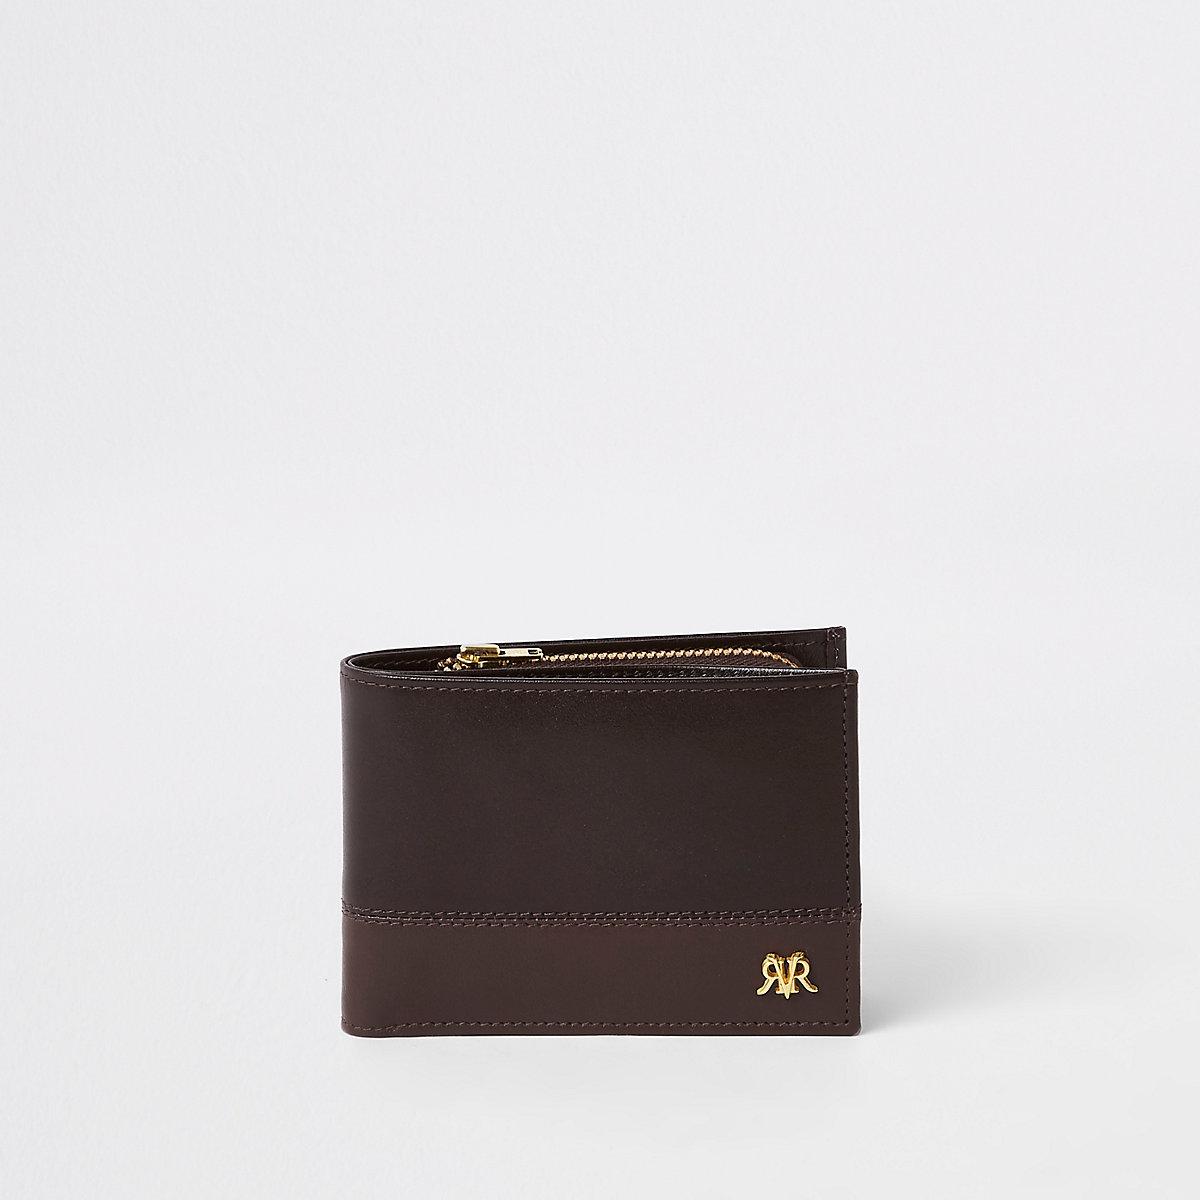 Portefeuille RI colour block en cuir marron